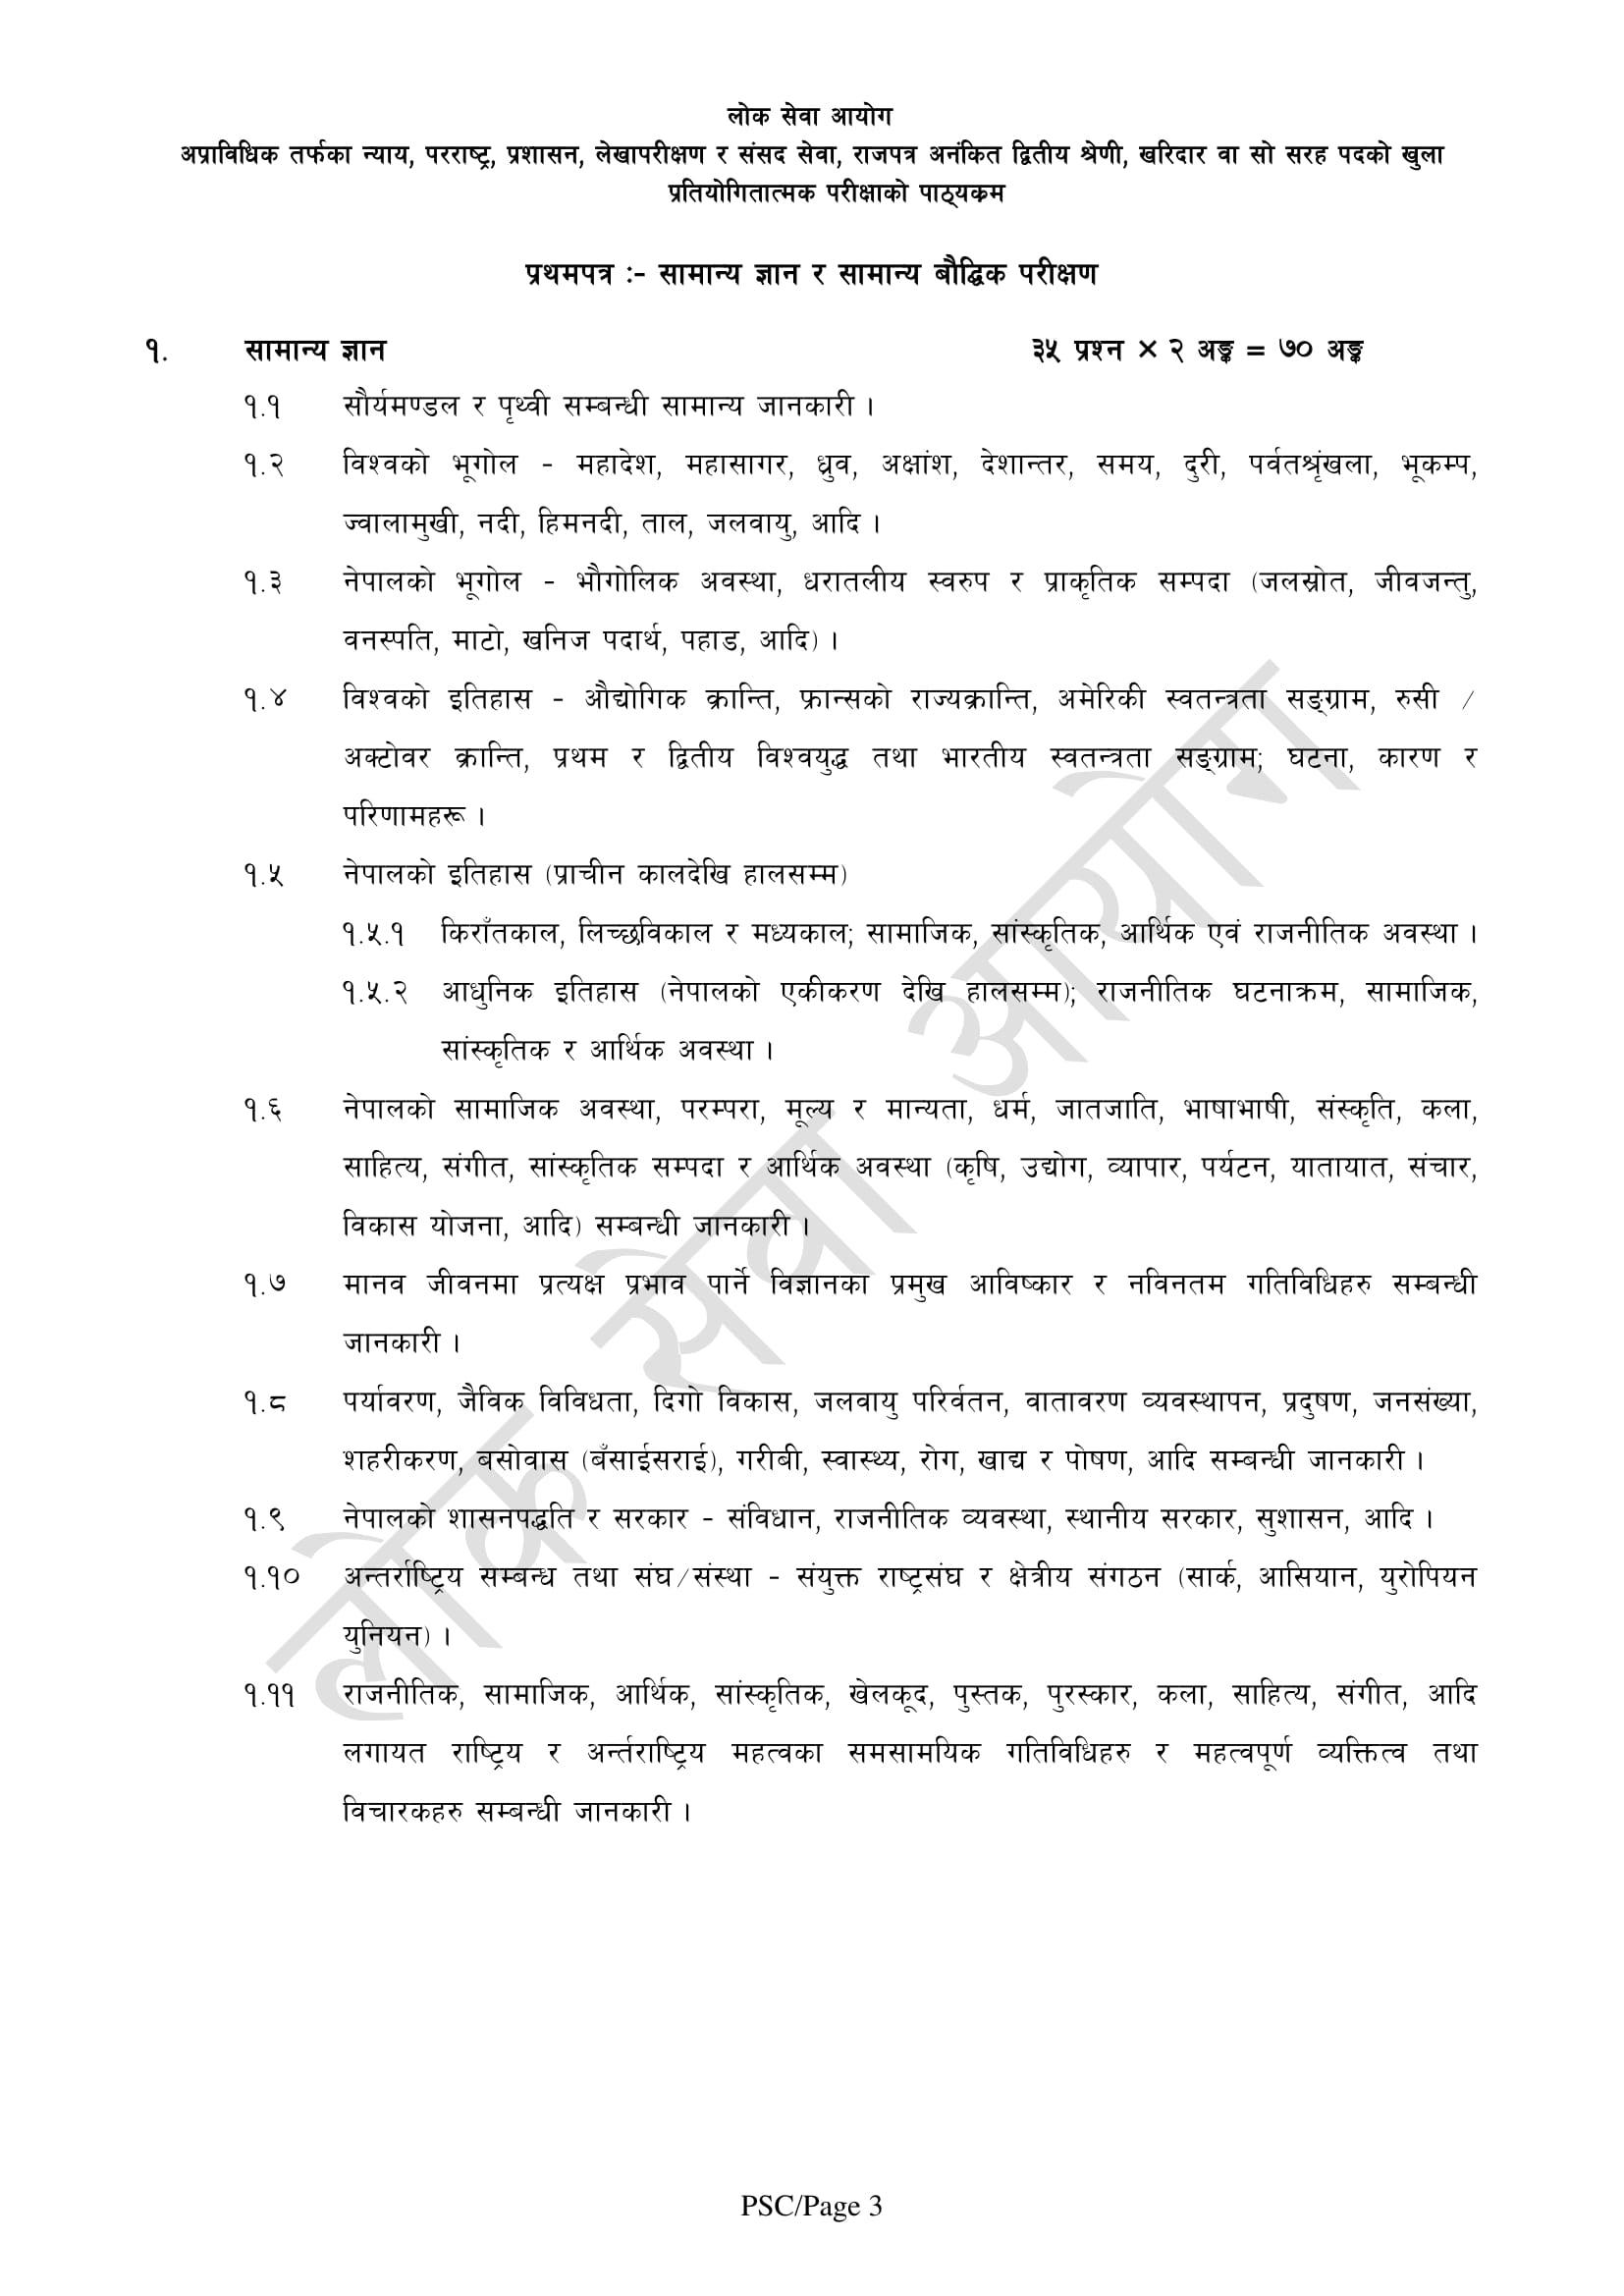 psc.gov.np syllabus, Kharidar syllabus, psc syllabus, kharidar book pdf, psc.gov.np kharidar syllabus, Kharidar kharidar syllabus, psc kharidar syllabus, lok sewa aayog kharidar syllabus, lok sewa aayog kharidar exam syllabus, lok sewa aayog  syllabus, lok sewa aayog exam syllabus, lok sewa aayog kharidar syllabus, lok sewa  kharidar syllabus, lok sewa  kharidar exam syllabus, lok sewa   syllabus, lok sewa  exam syllabus, lok sewa  kharidar syllabus,